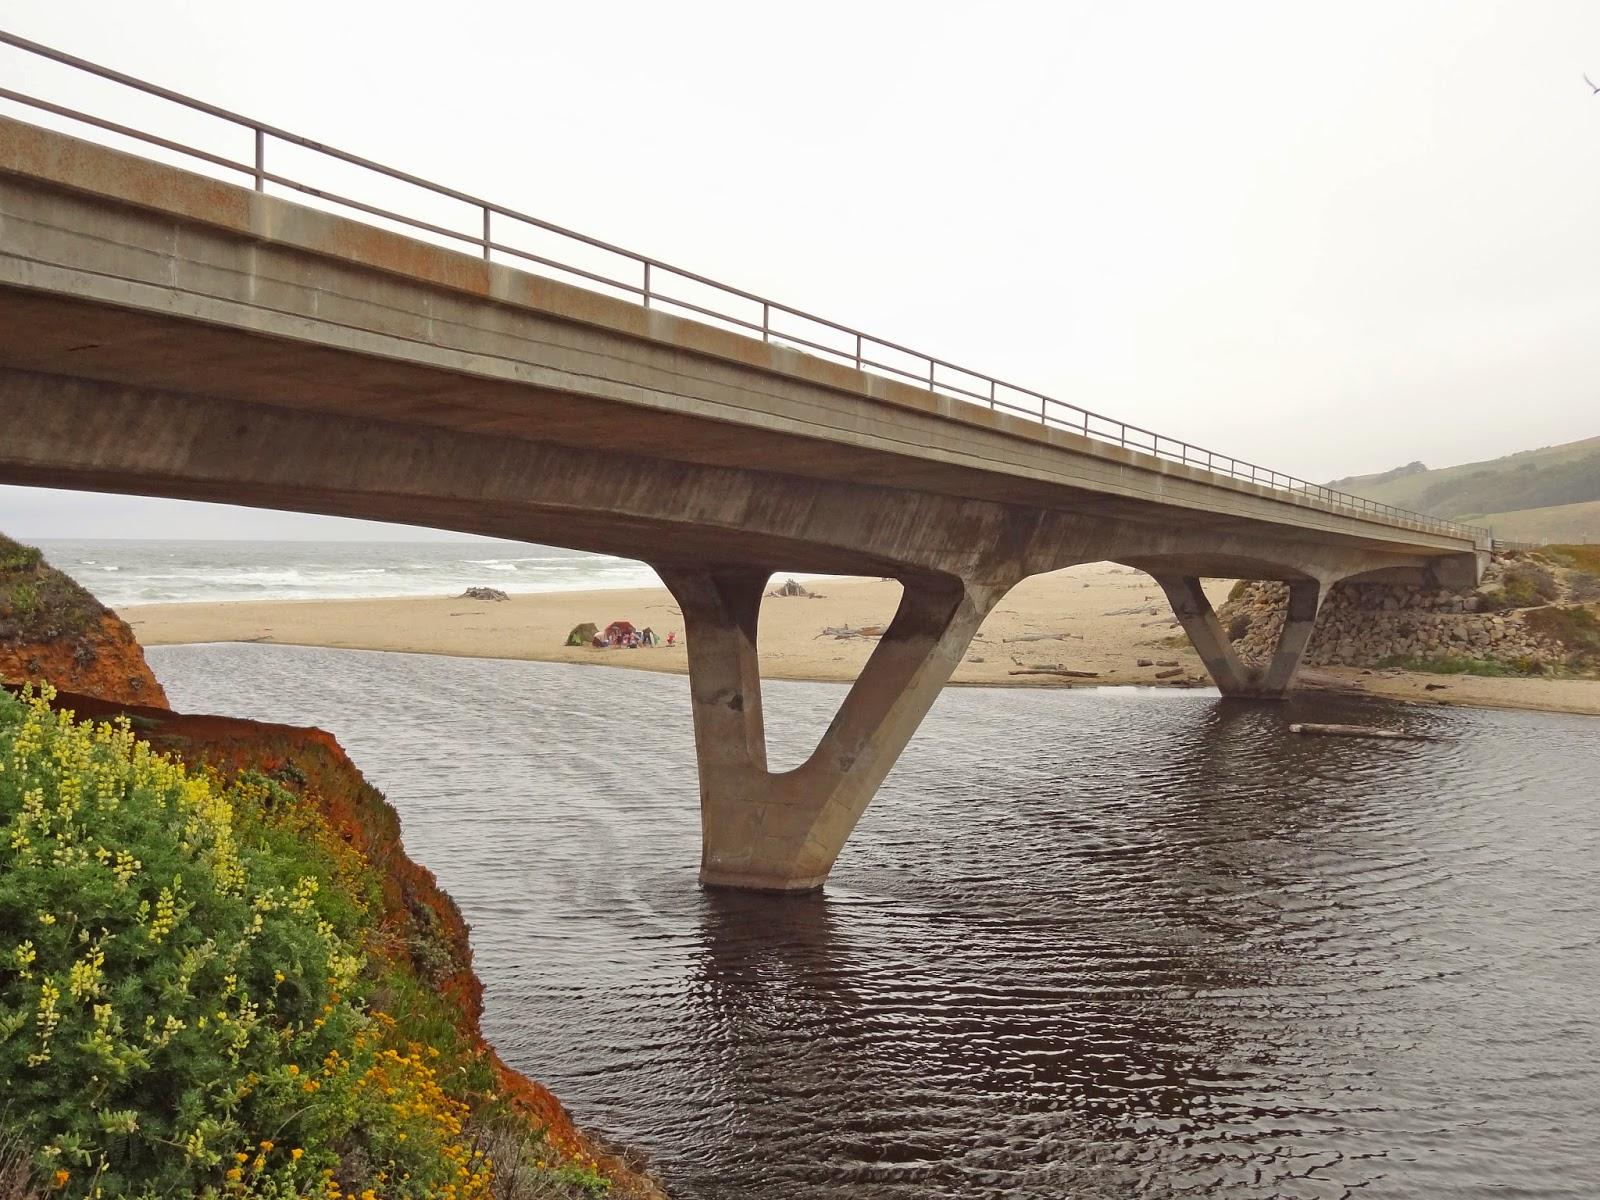 California san mateo county pescadero - San Mateo County California Bridges State Route 1 Across Pescadero Creek 2